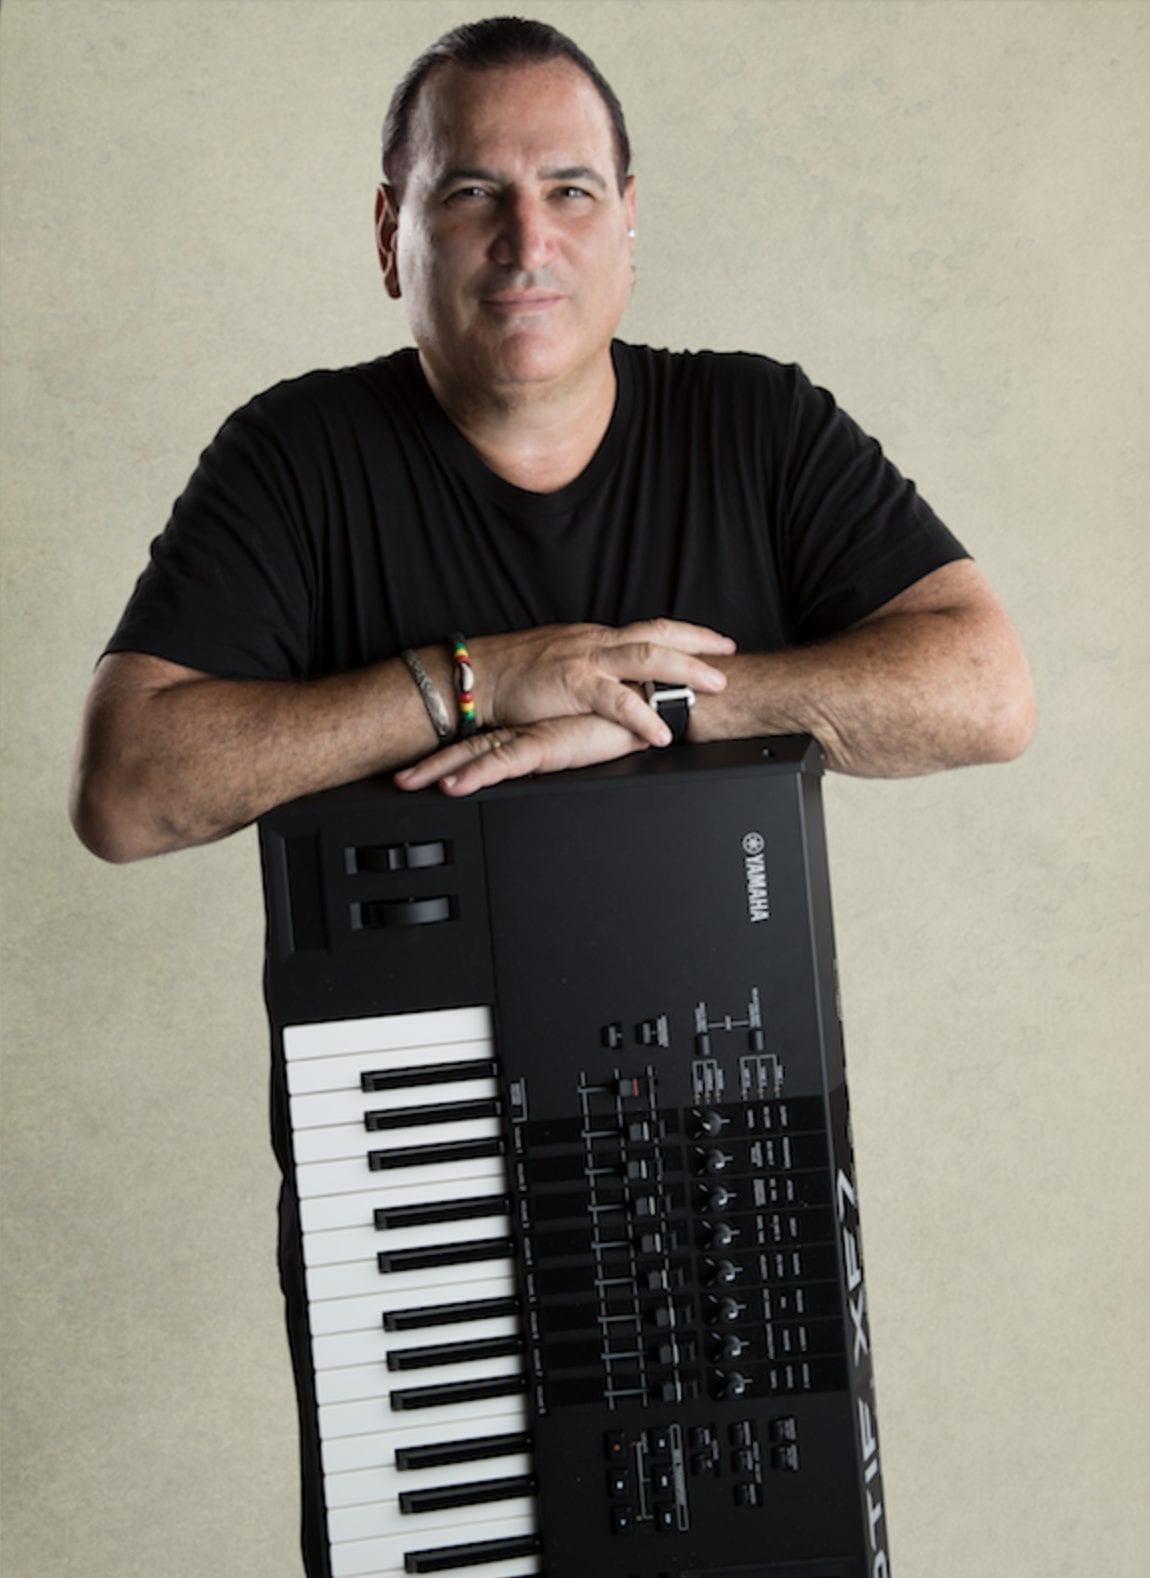 David Garfield and his instrument